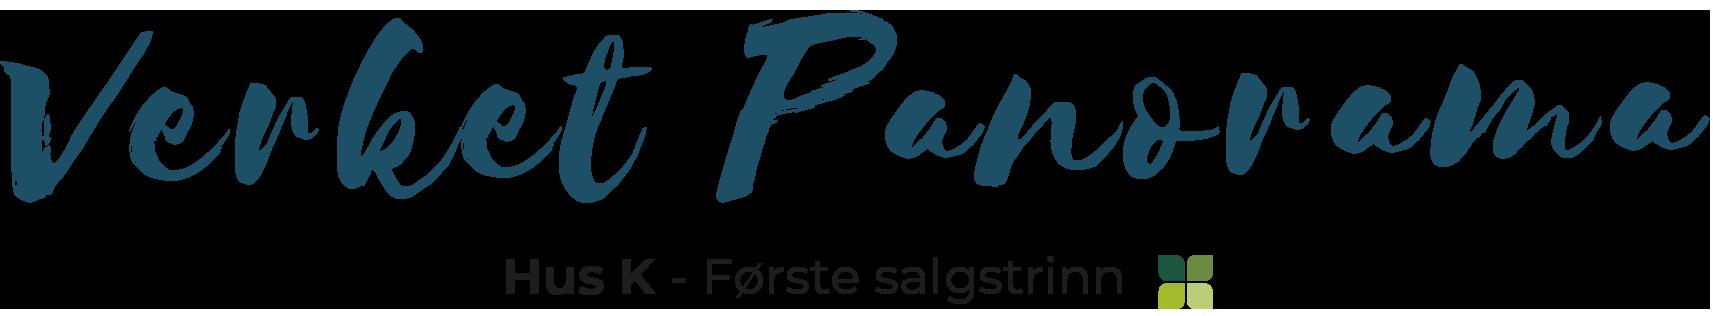 Logo Verket Panorama_Hus K-1